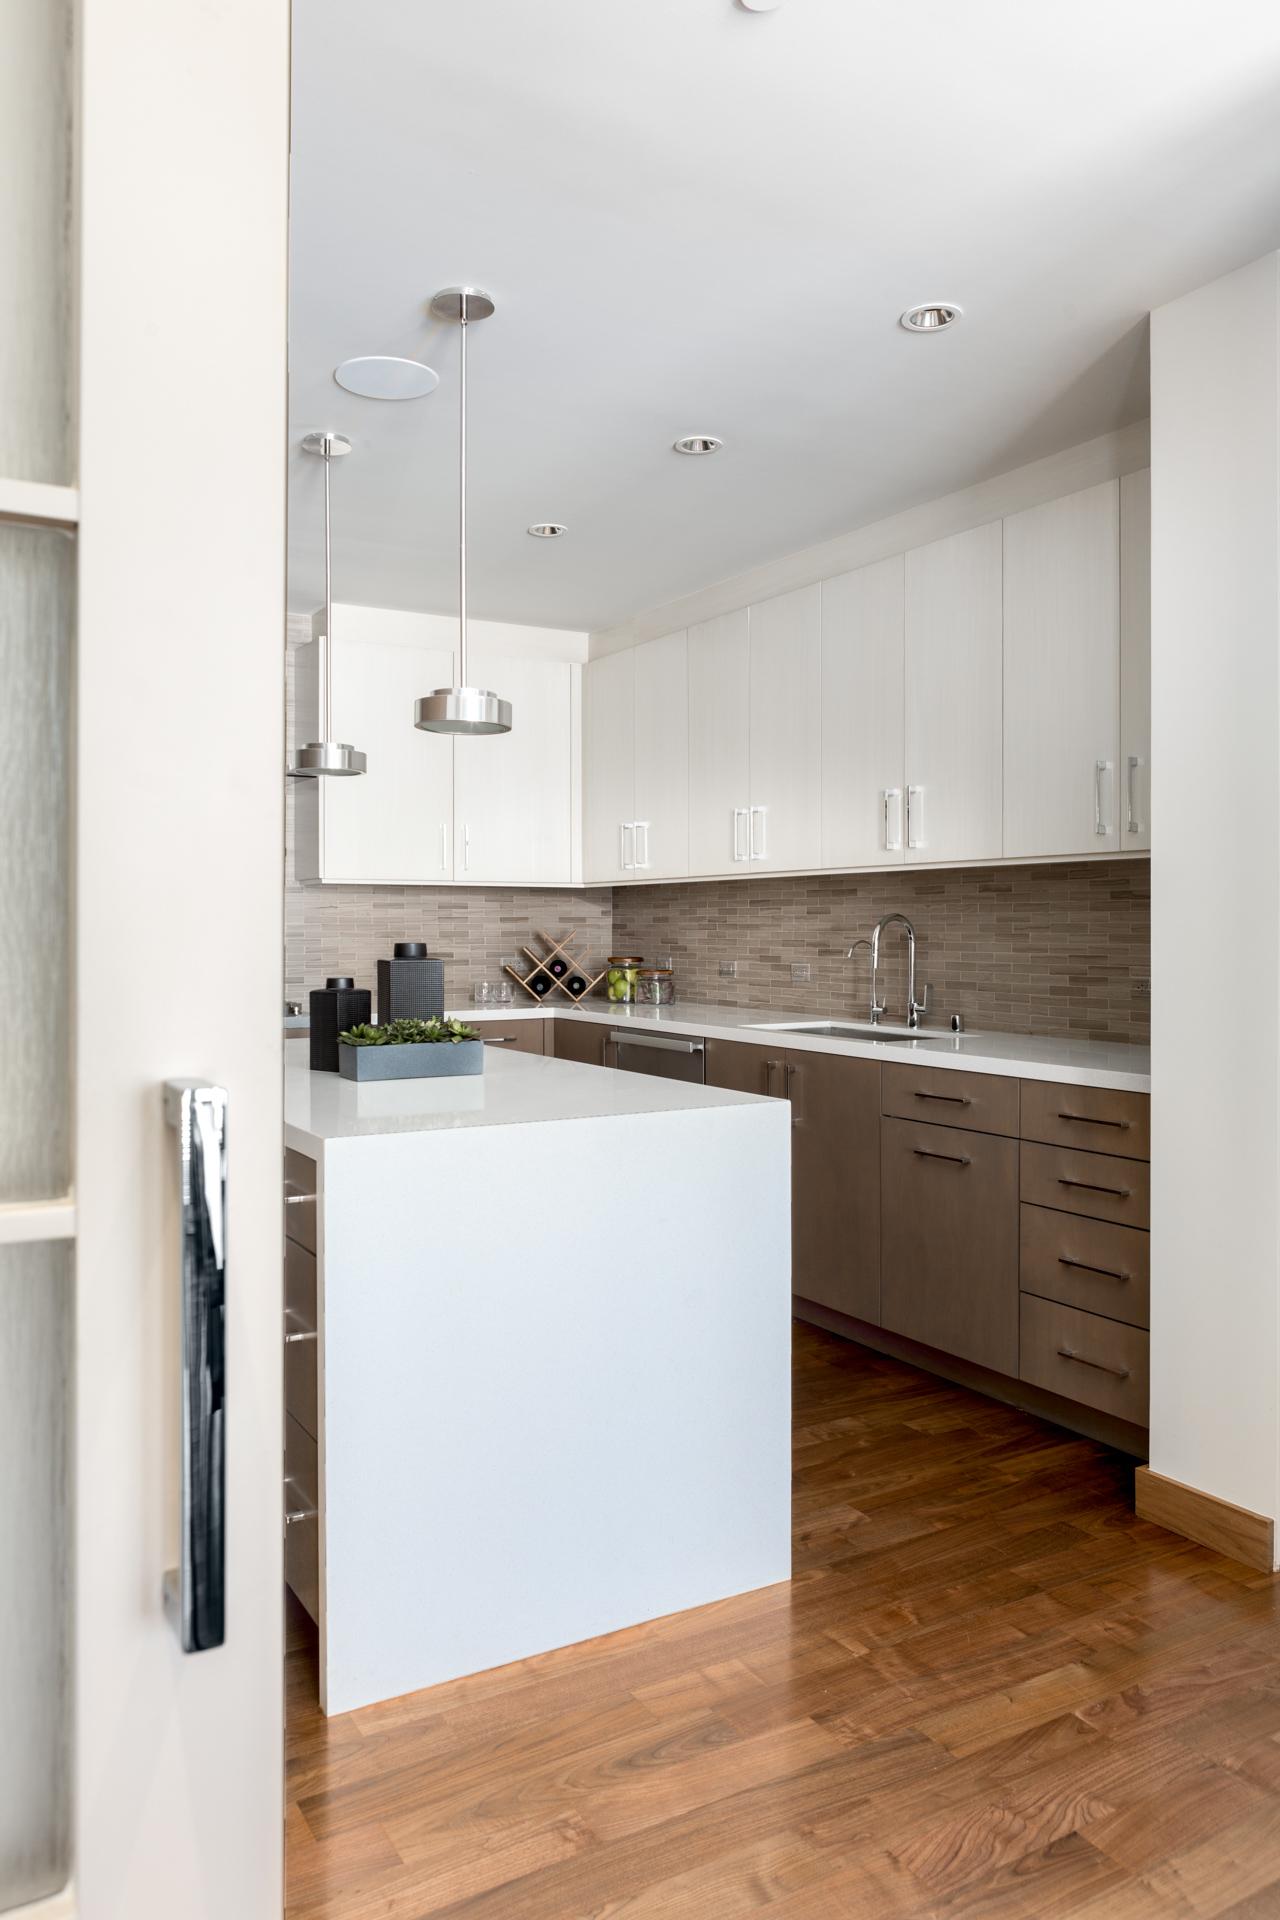 Mandarin Oriental Unit 2403 - Luxury Homes Las Vegas